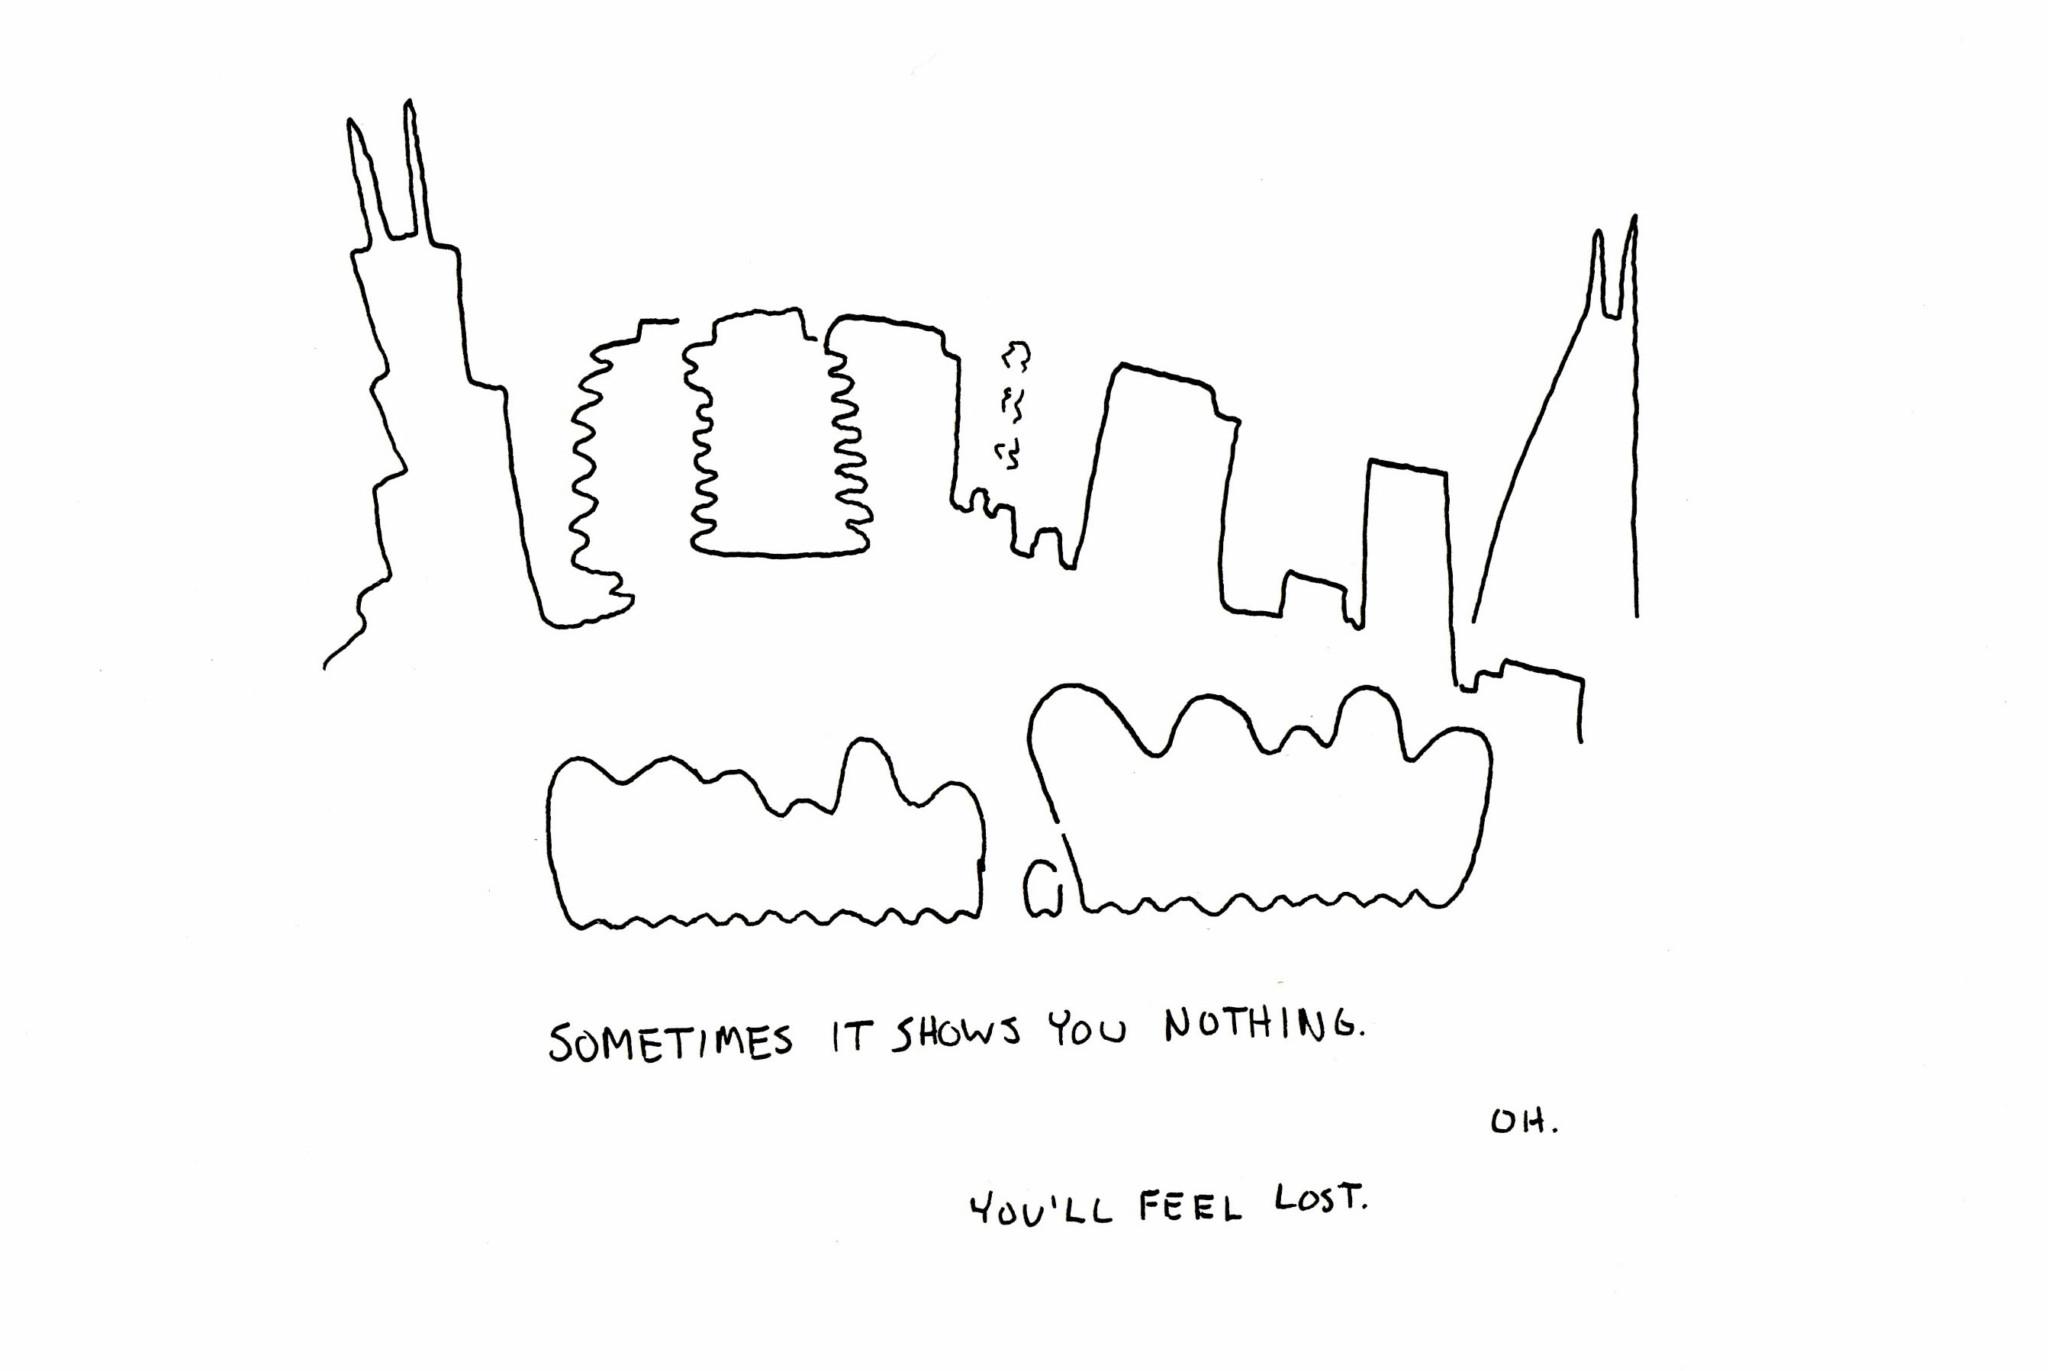 City5_DanRowell